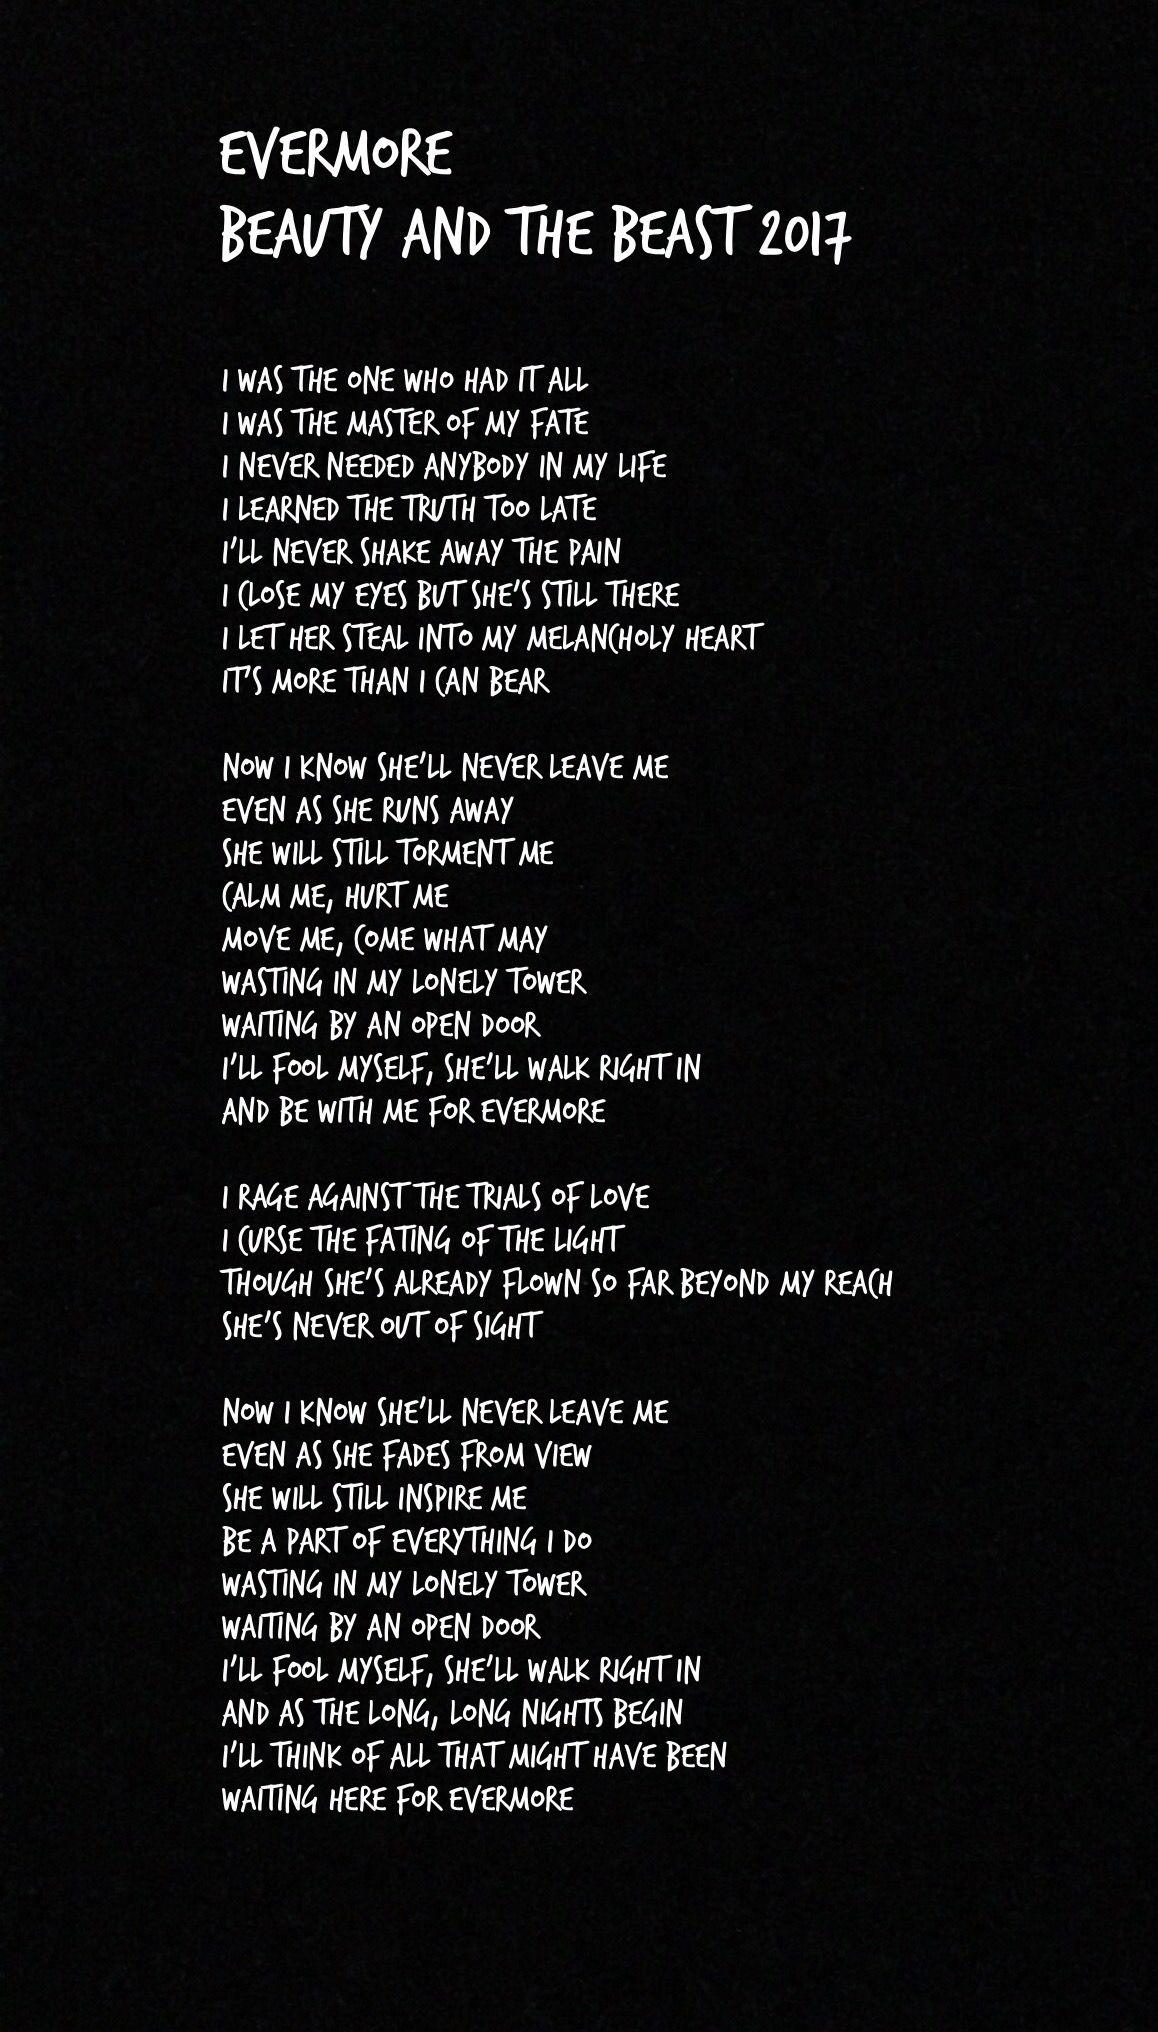 beauty and the beast lyrics # 4